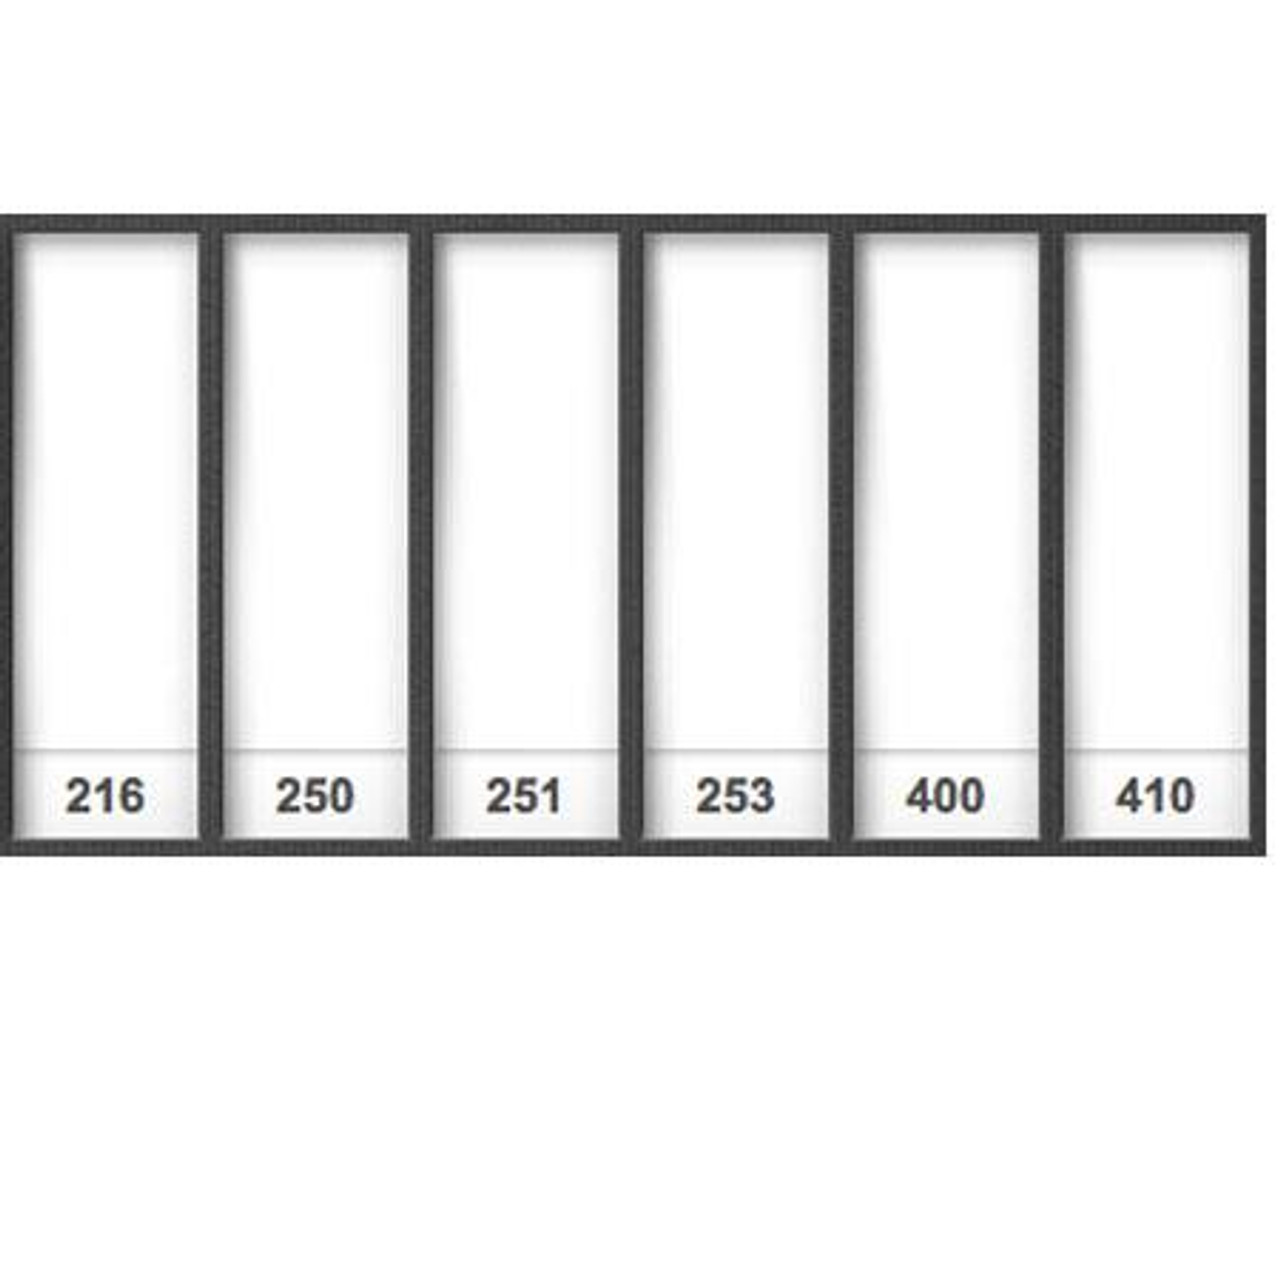 507 - Diffusion Pack (12 Sheets), Gels